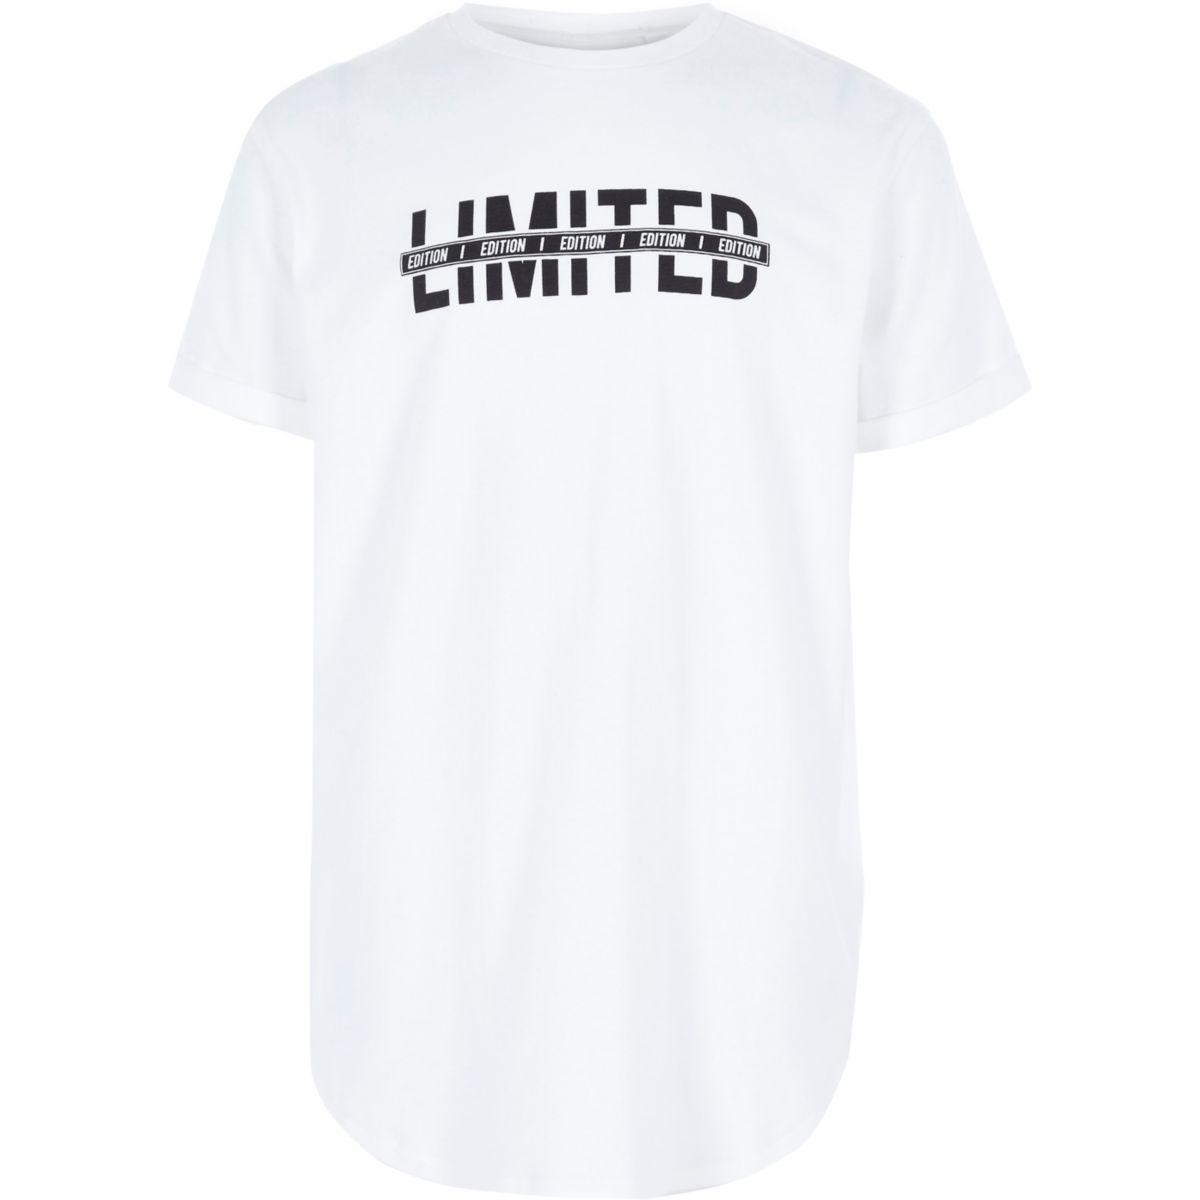 Boys white 'limited' print T-shirt